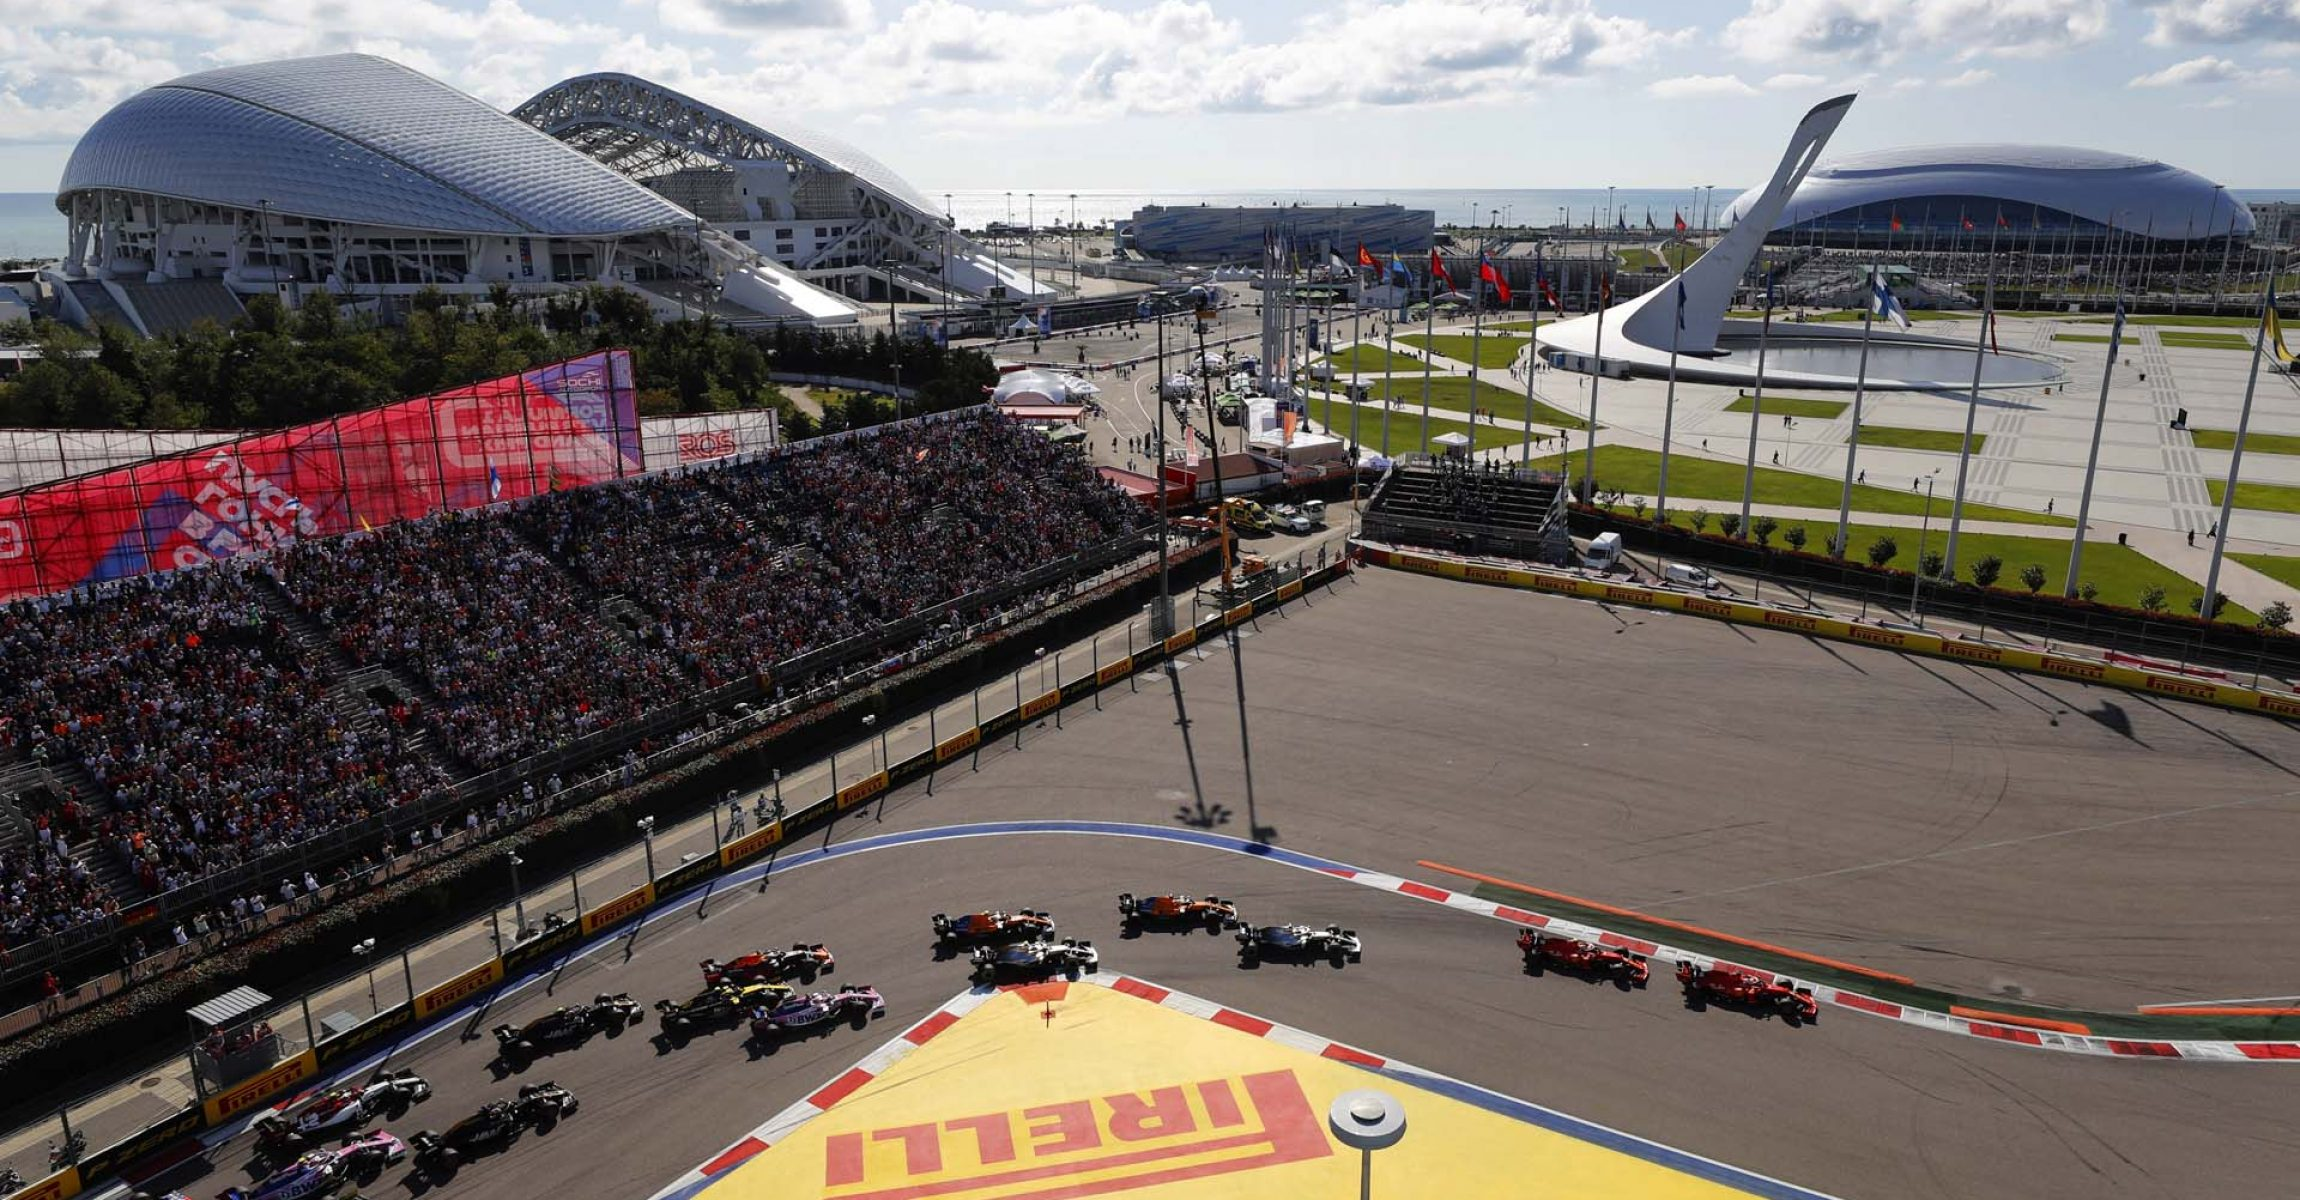 2019 Russian Grand Prix, Sunday - LAT Images Russian Grand Prix start